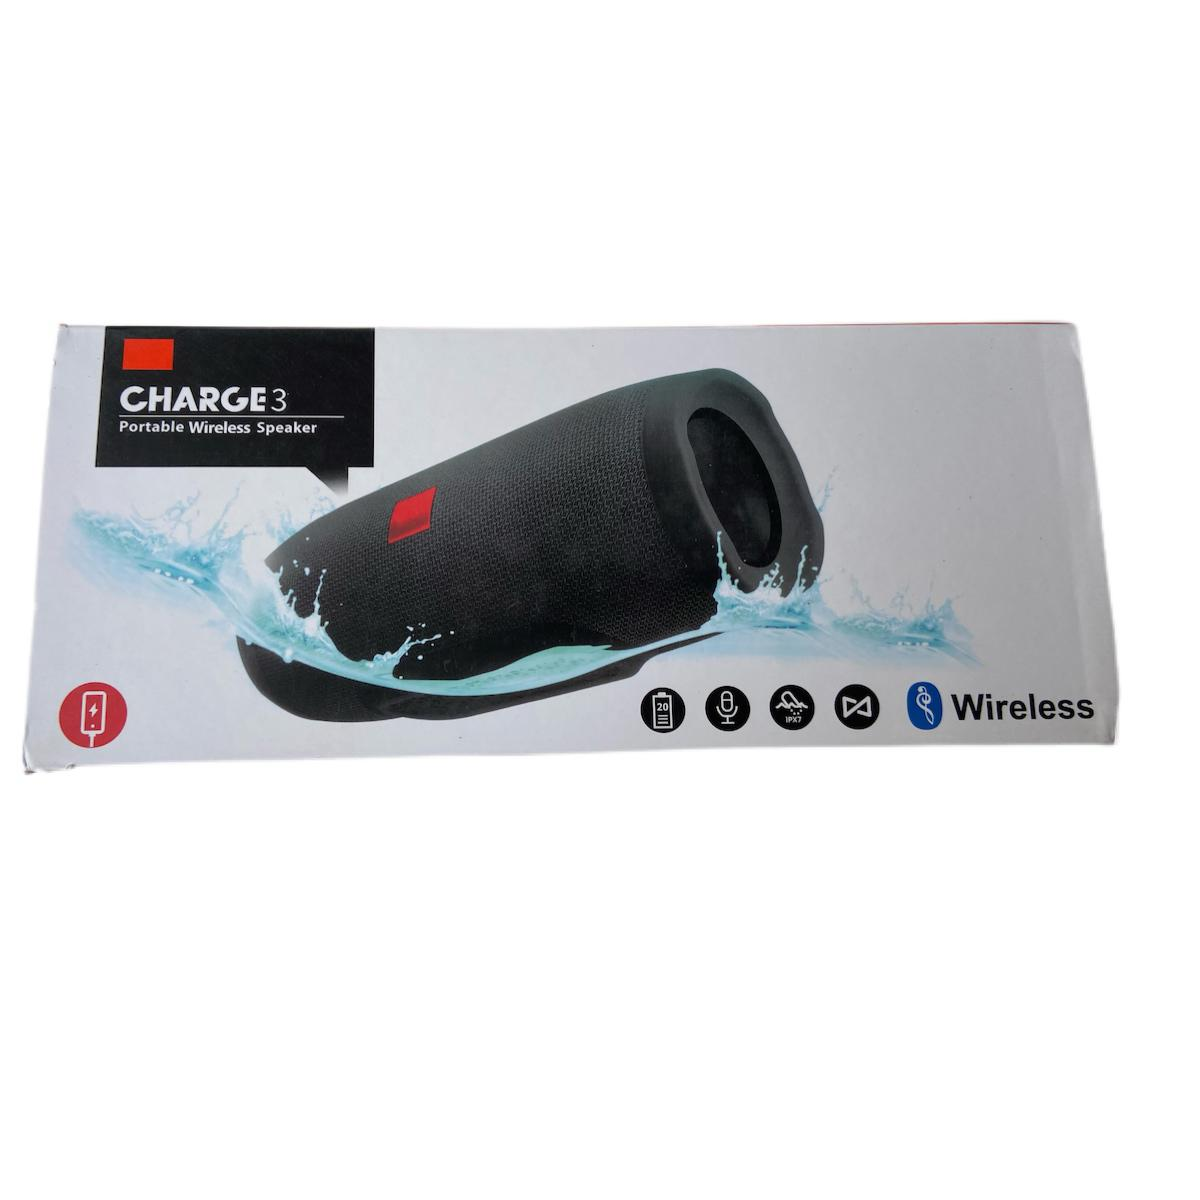 CHARGE 3 CAIXA DE SOM PORTATIL BLUETOOTH/USB/AUX CARREGA AZUL